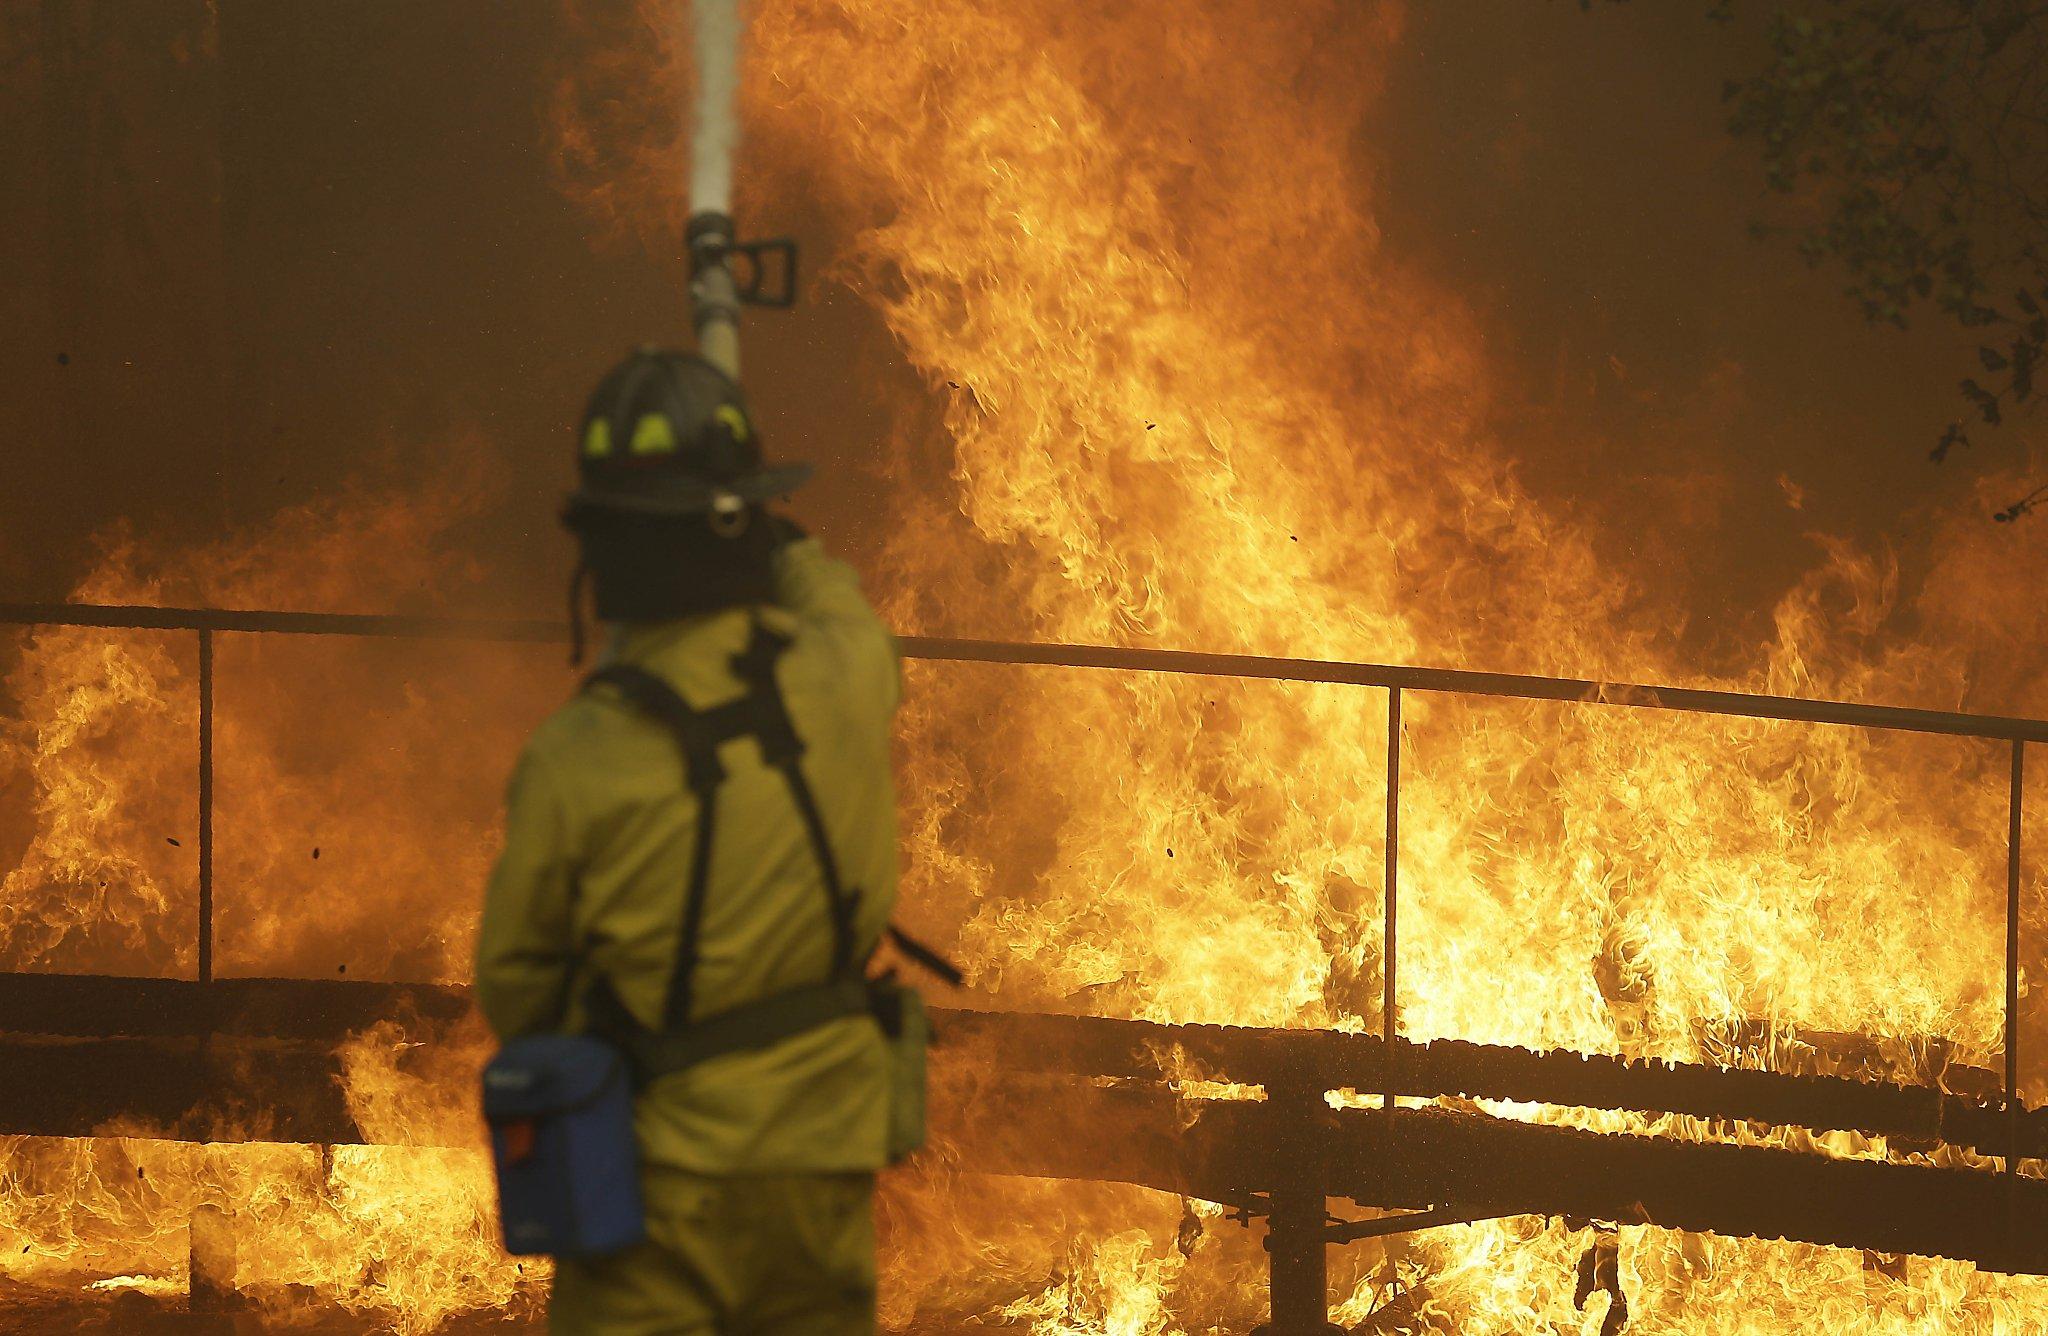 Flaming Prorected Teens Splitting